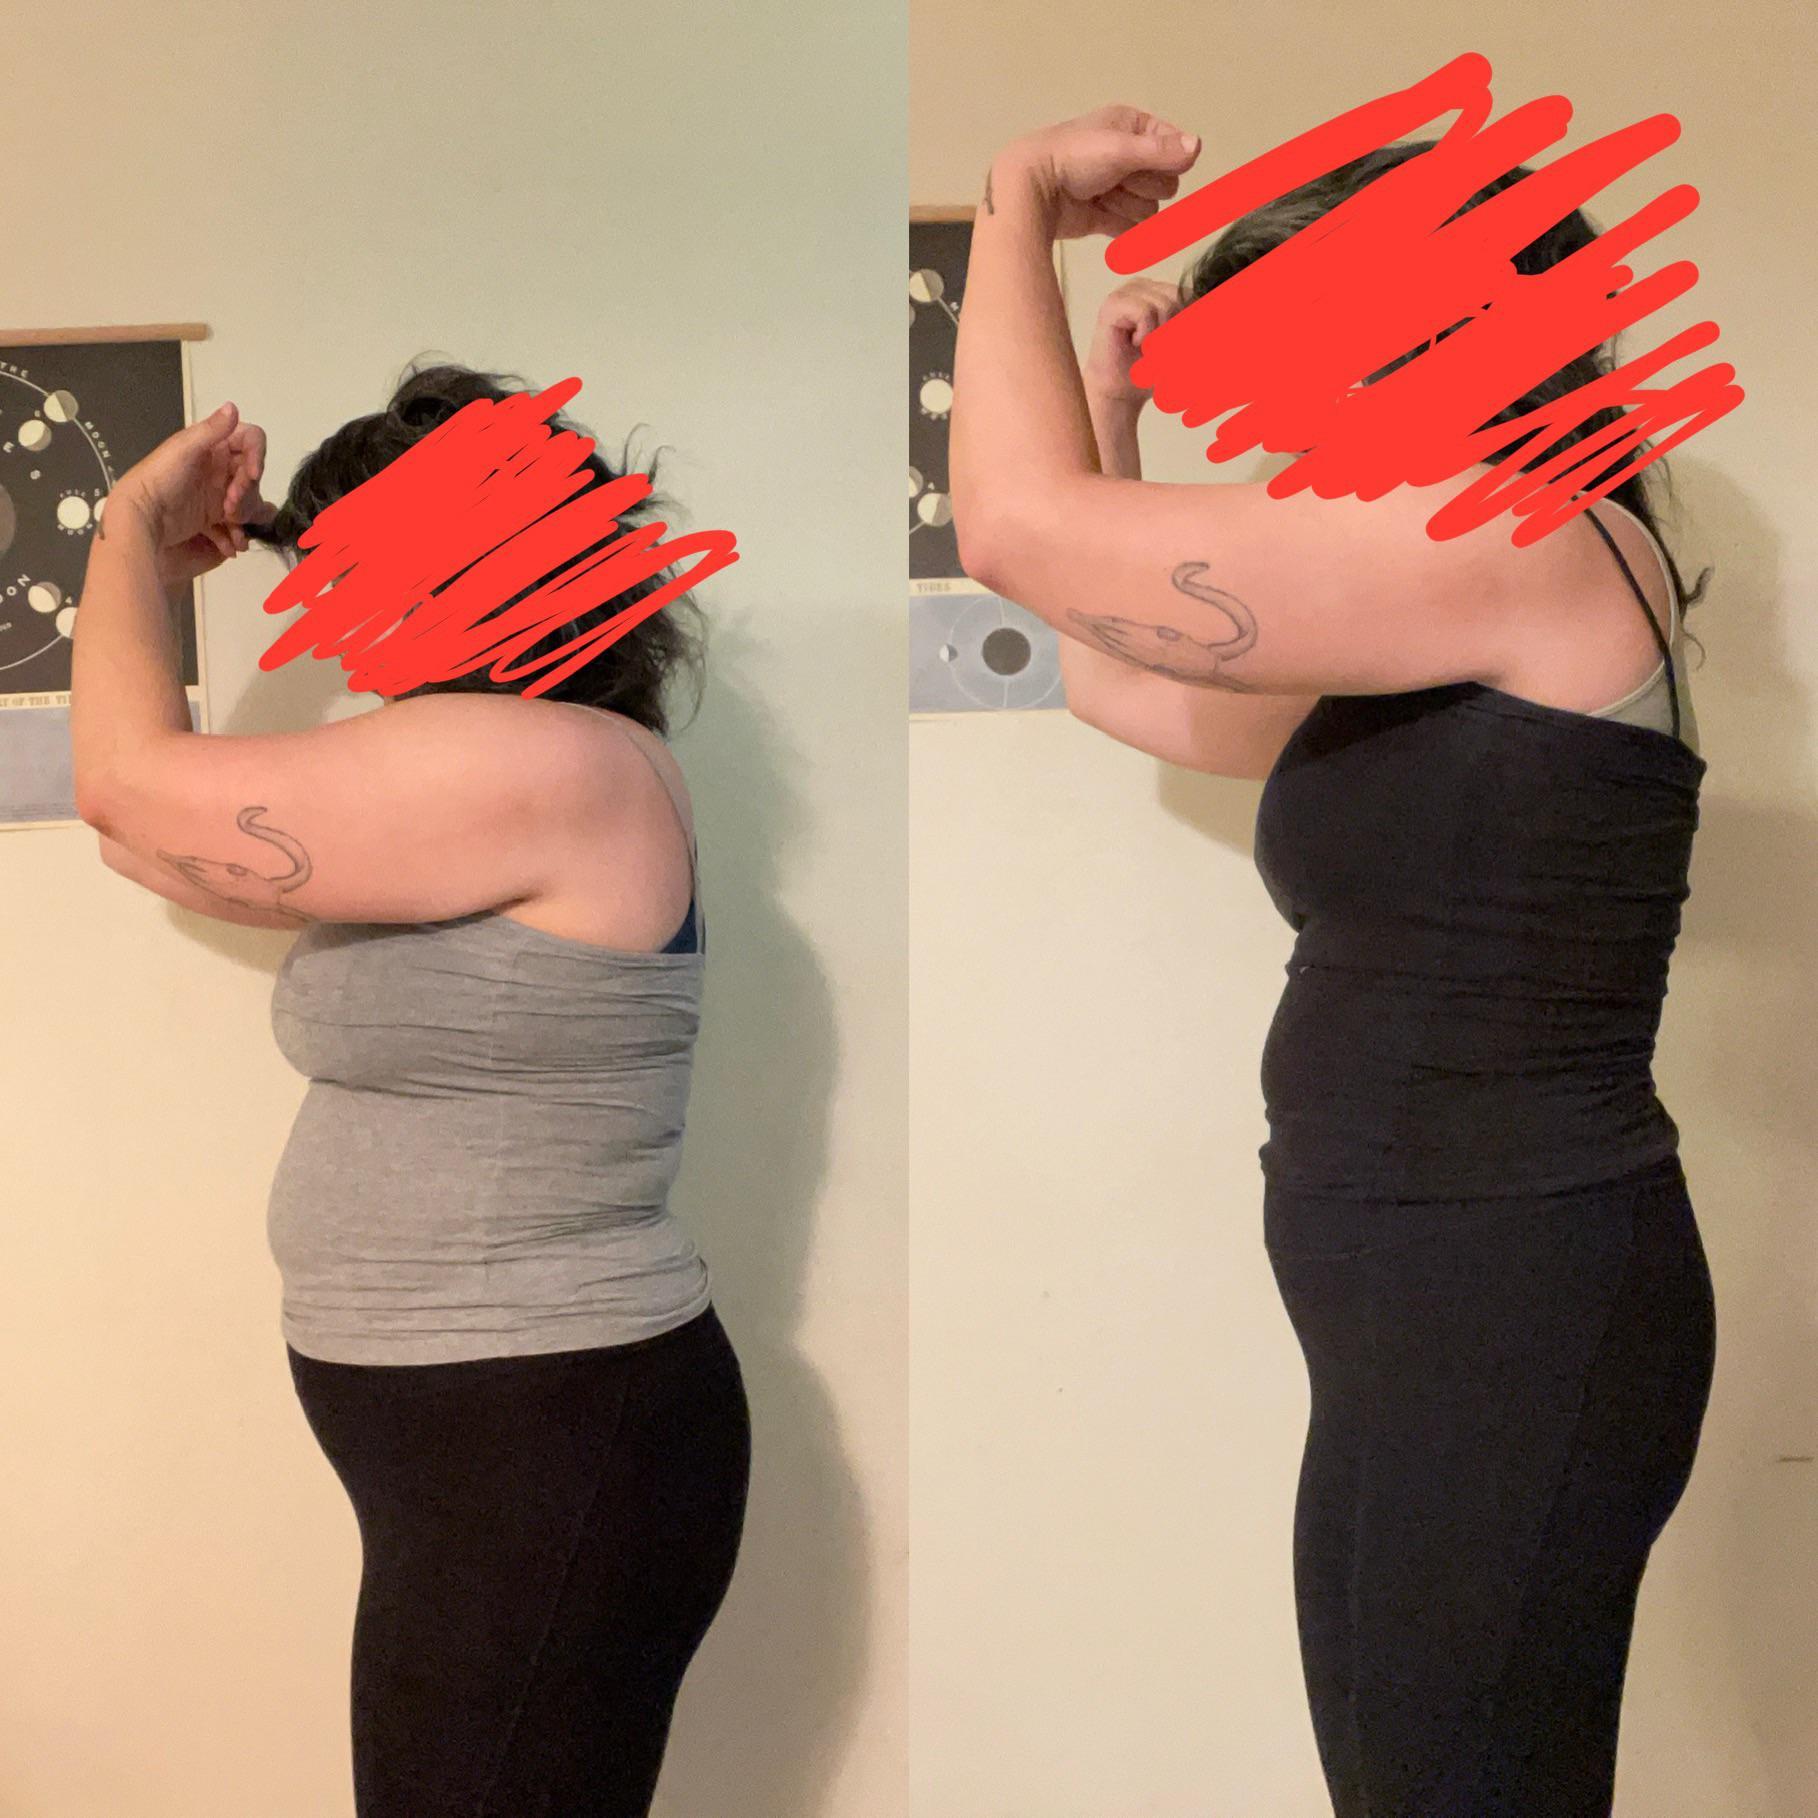 5'6 Female 30 lbs Fat Loss 212 lbs to 182 lbs